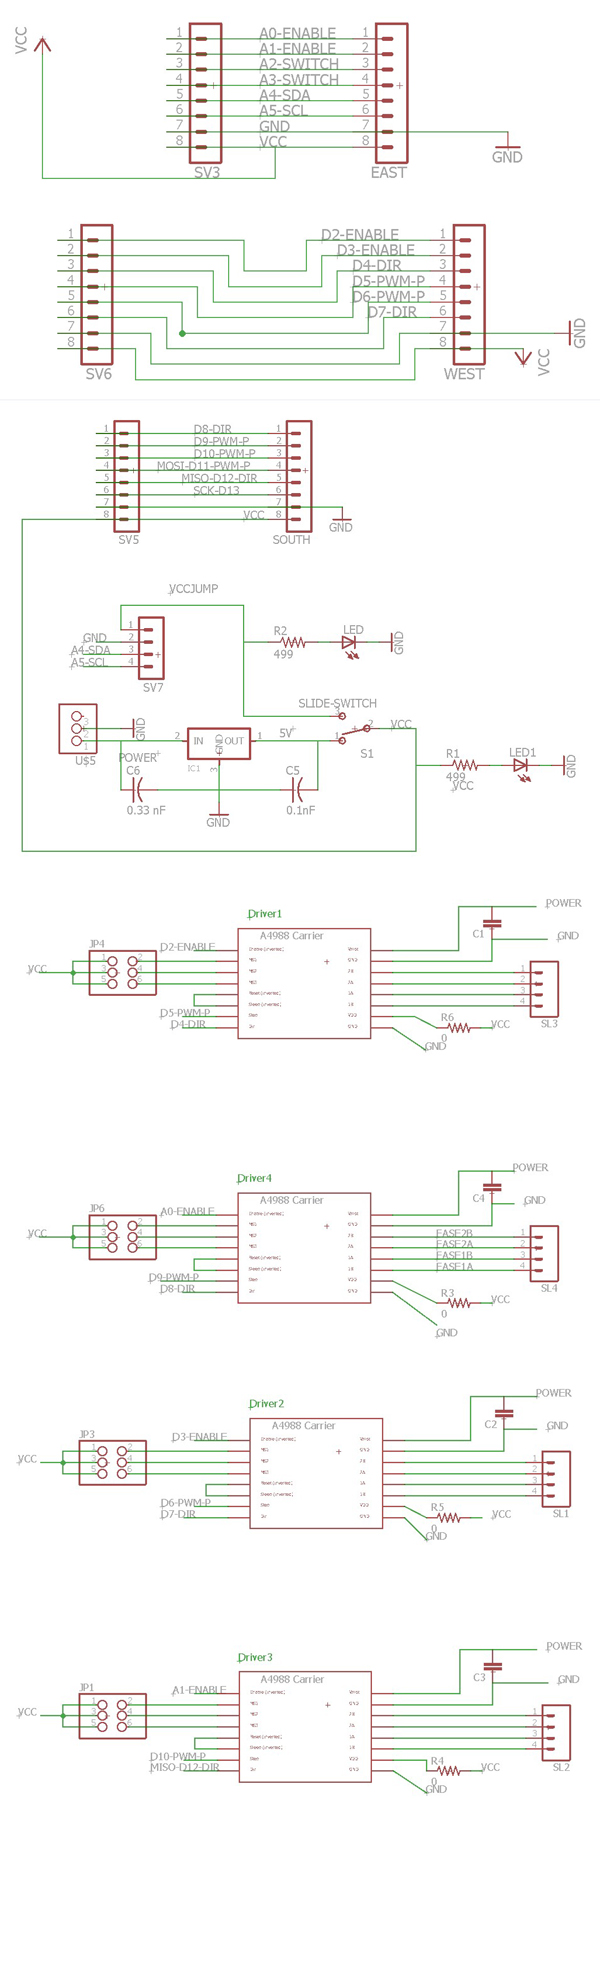 Final Project Development Md F935 Wiring Diagram Schematic Y